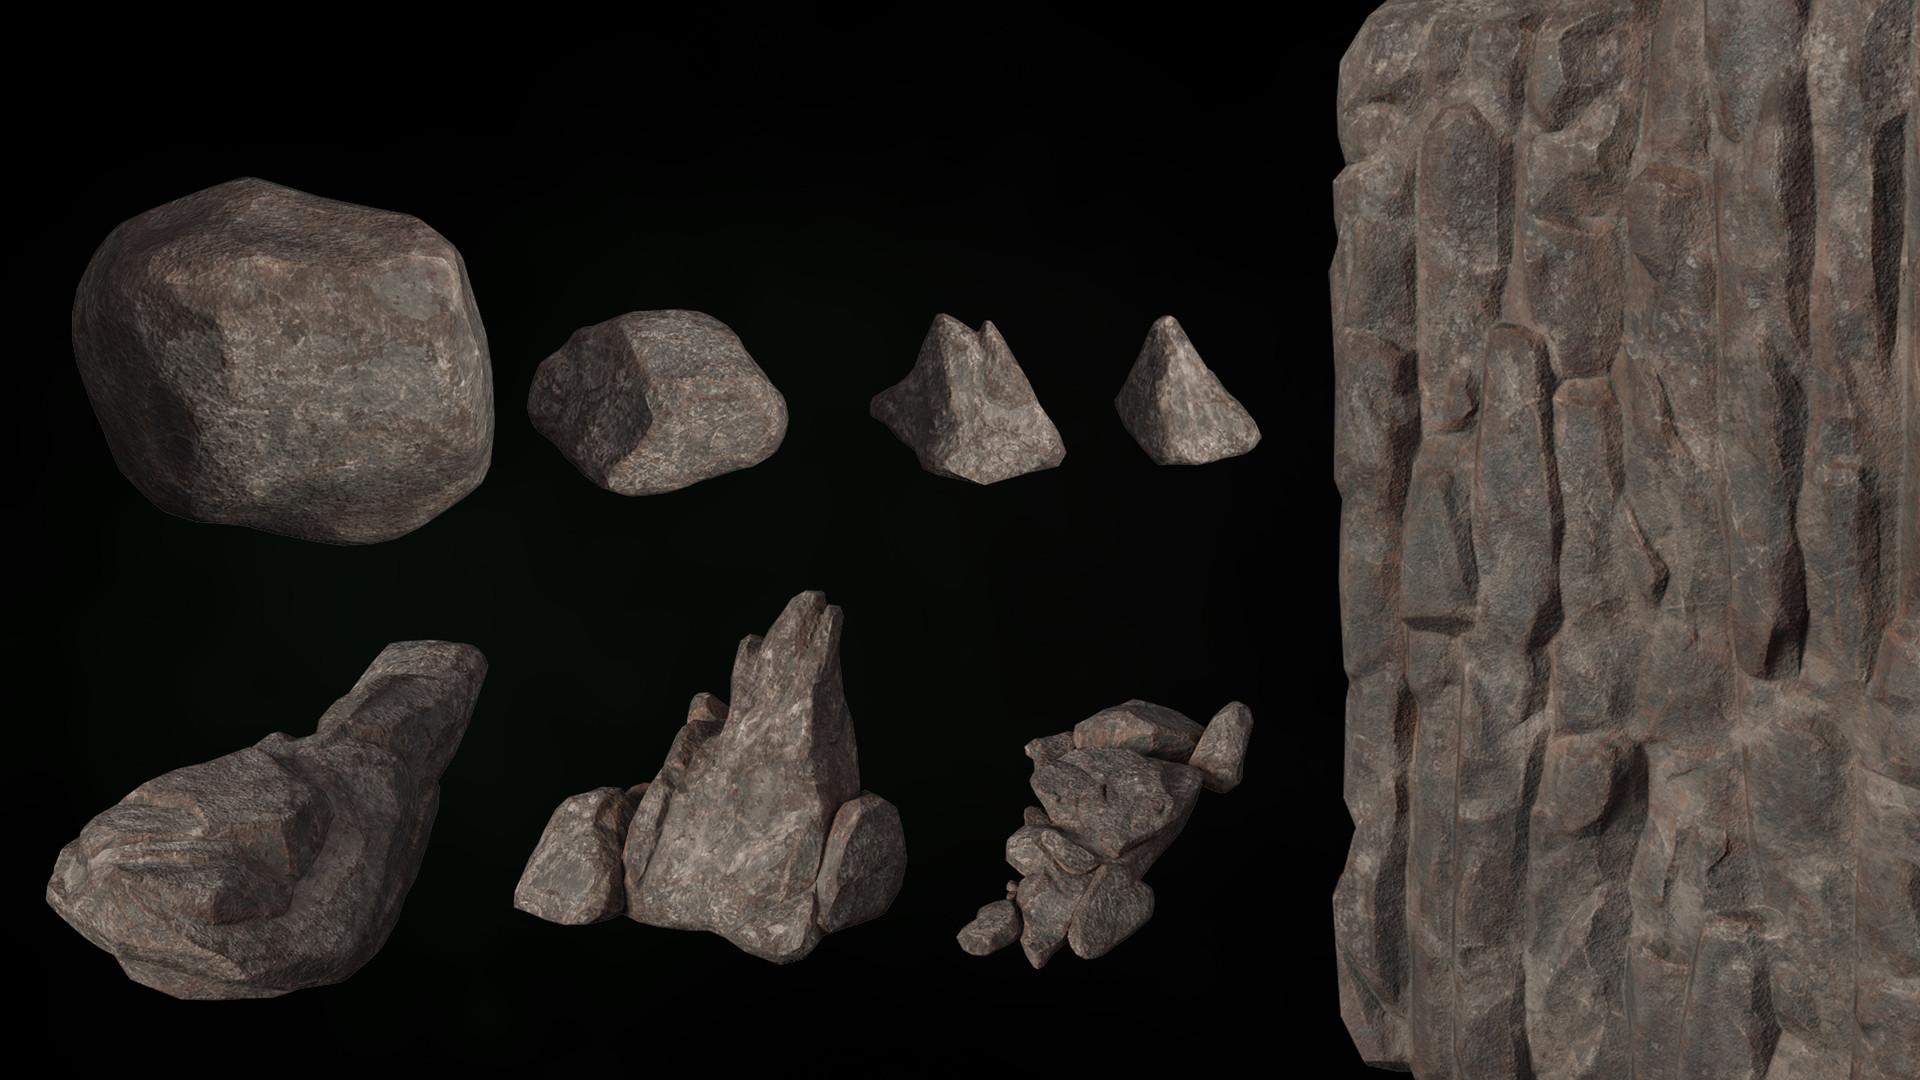 Johan qvarfordt rocks01